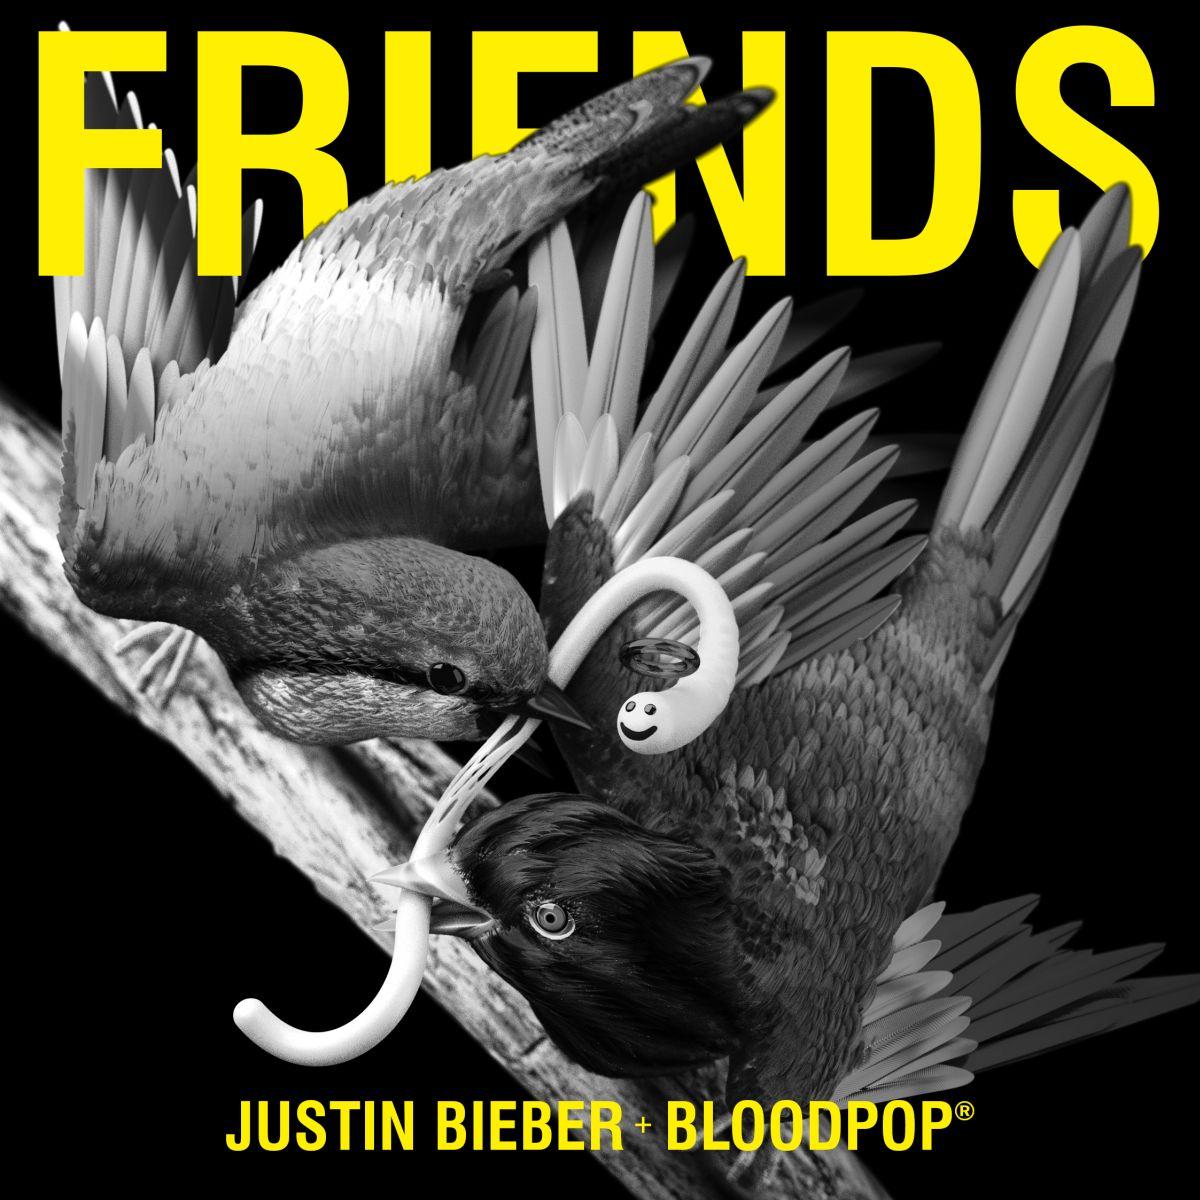 Cover: JUSTIN BIEBER FEAT. BLOODPOP, FRIENDS